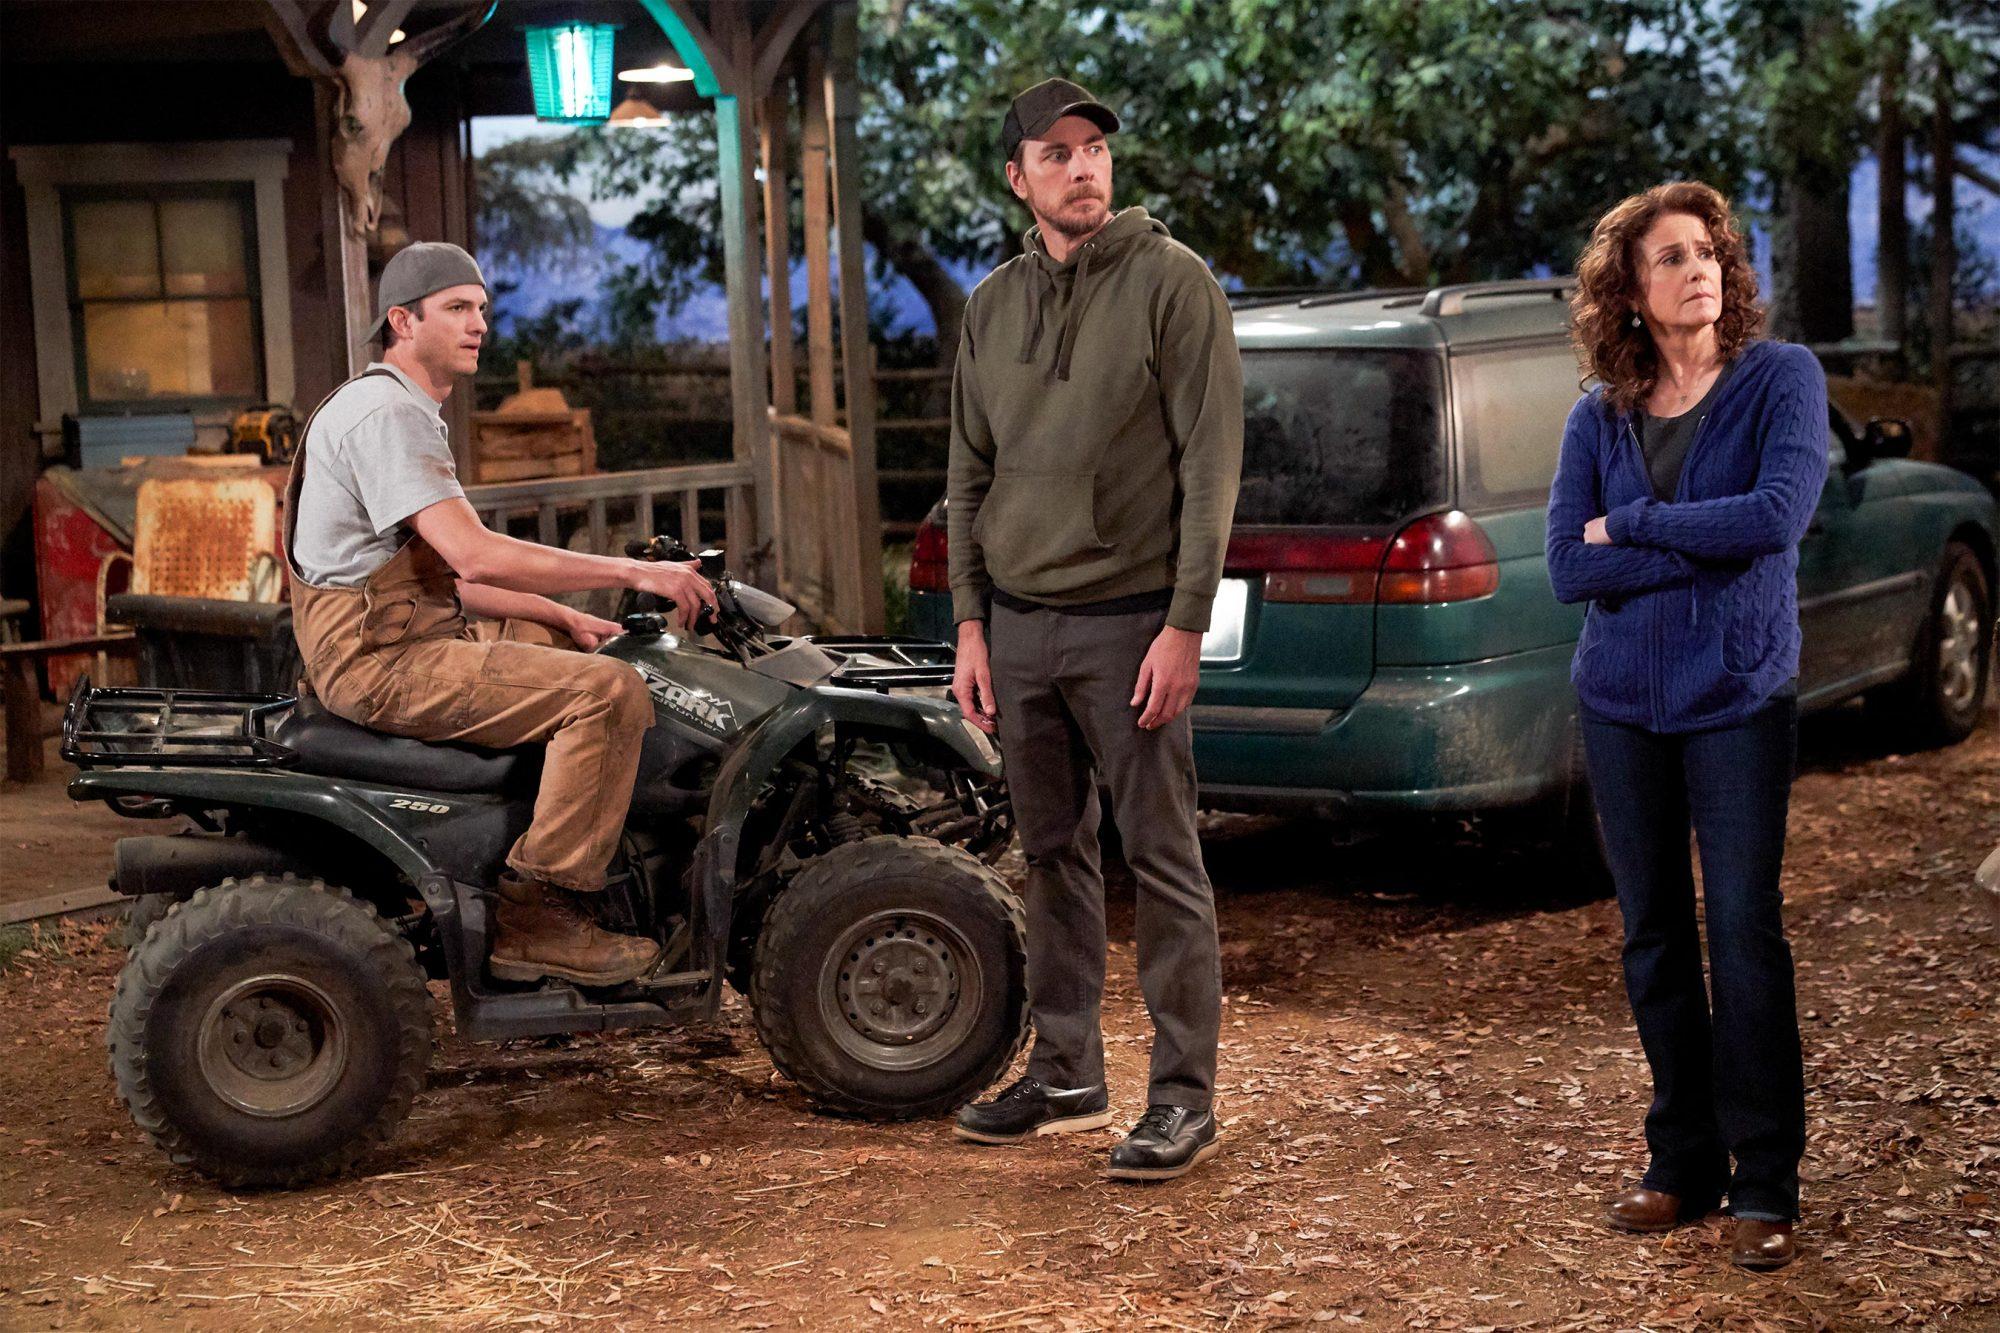 The Ranch SEASON Part 6 EPISODE 17 PHOTO CREDIT Greg Gaynei / Netflix PICTURED Ashton Kutcher, Dax Shepard, Debra Winger